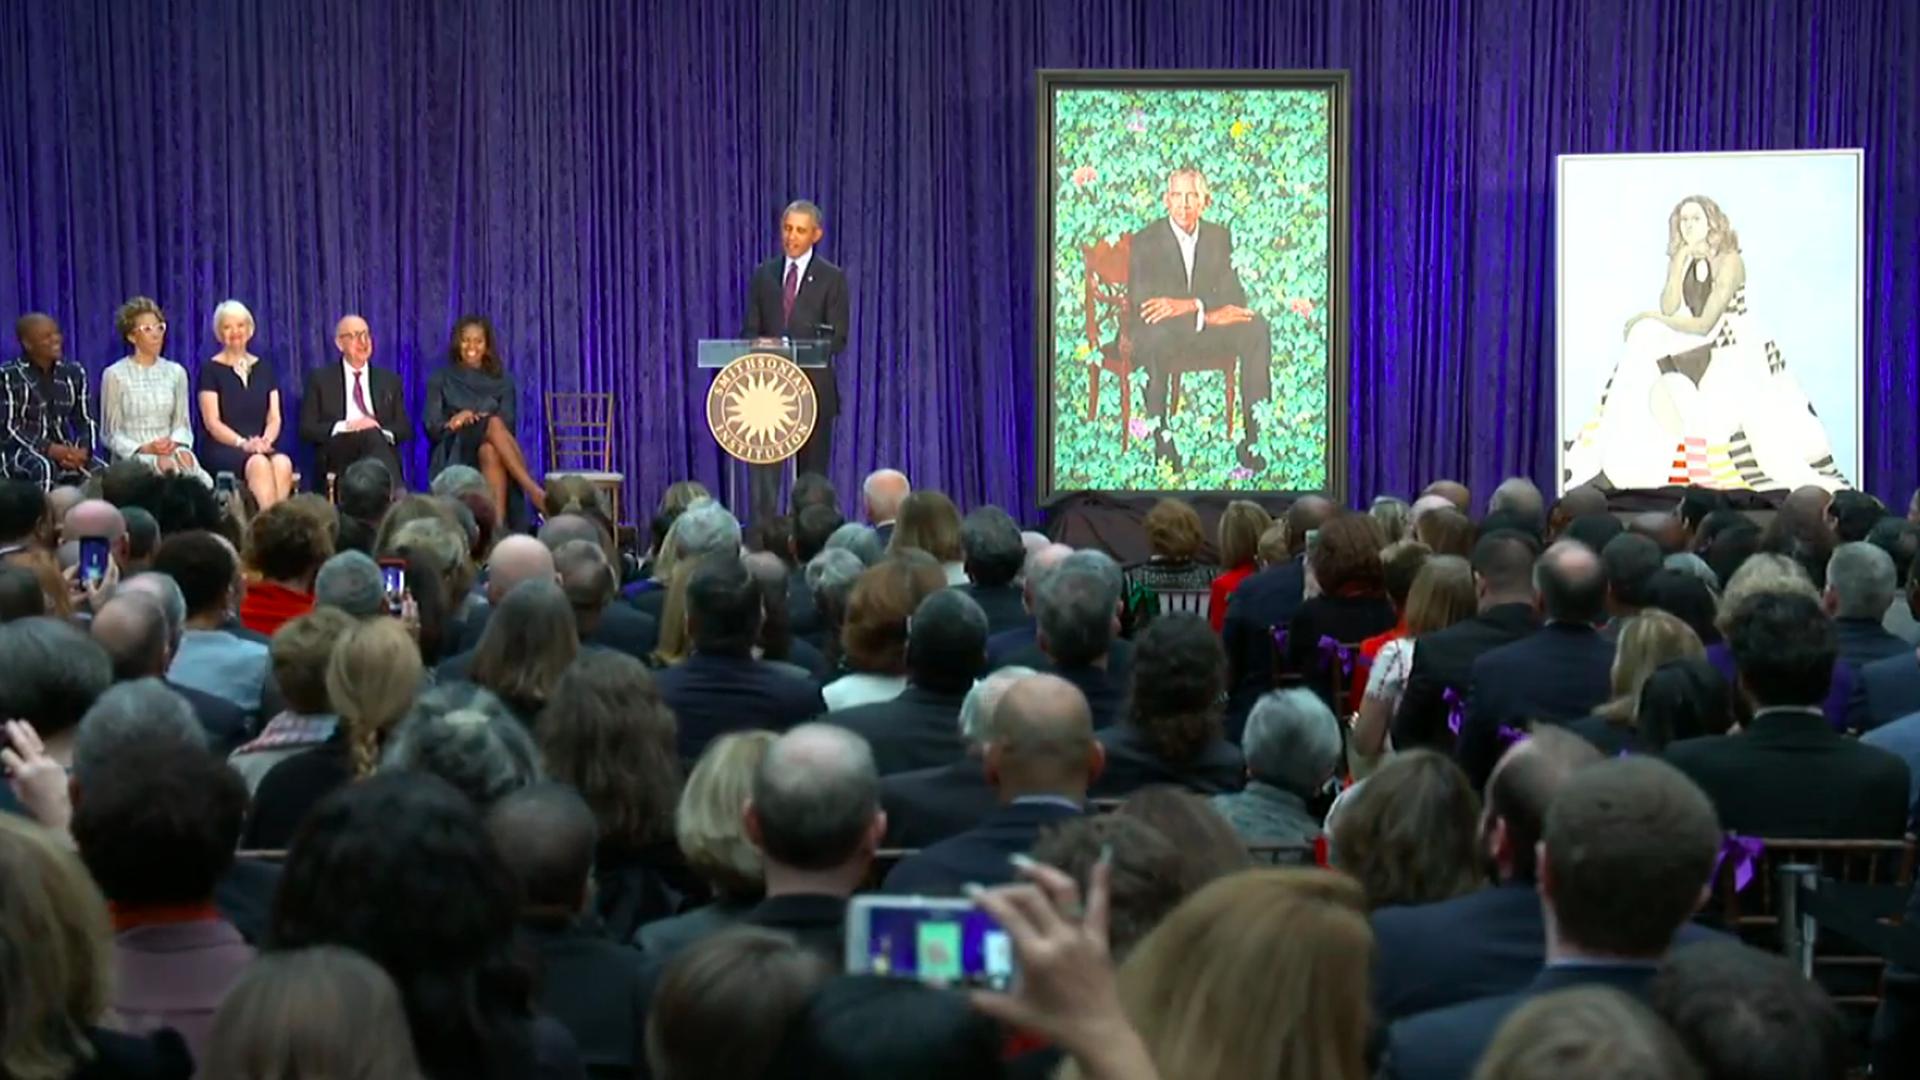 Obama at portrait unveiling